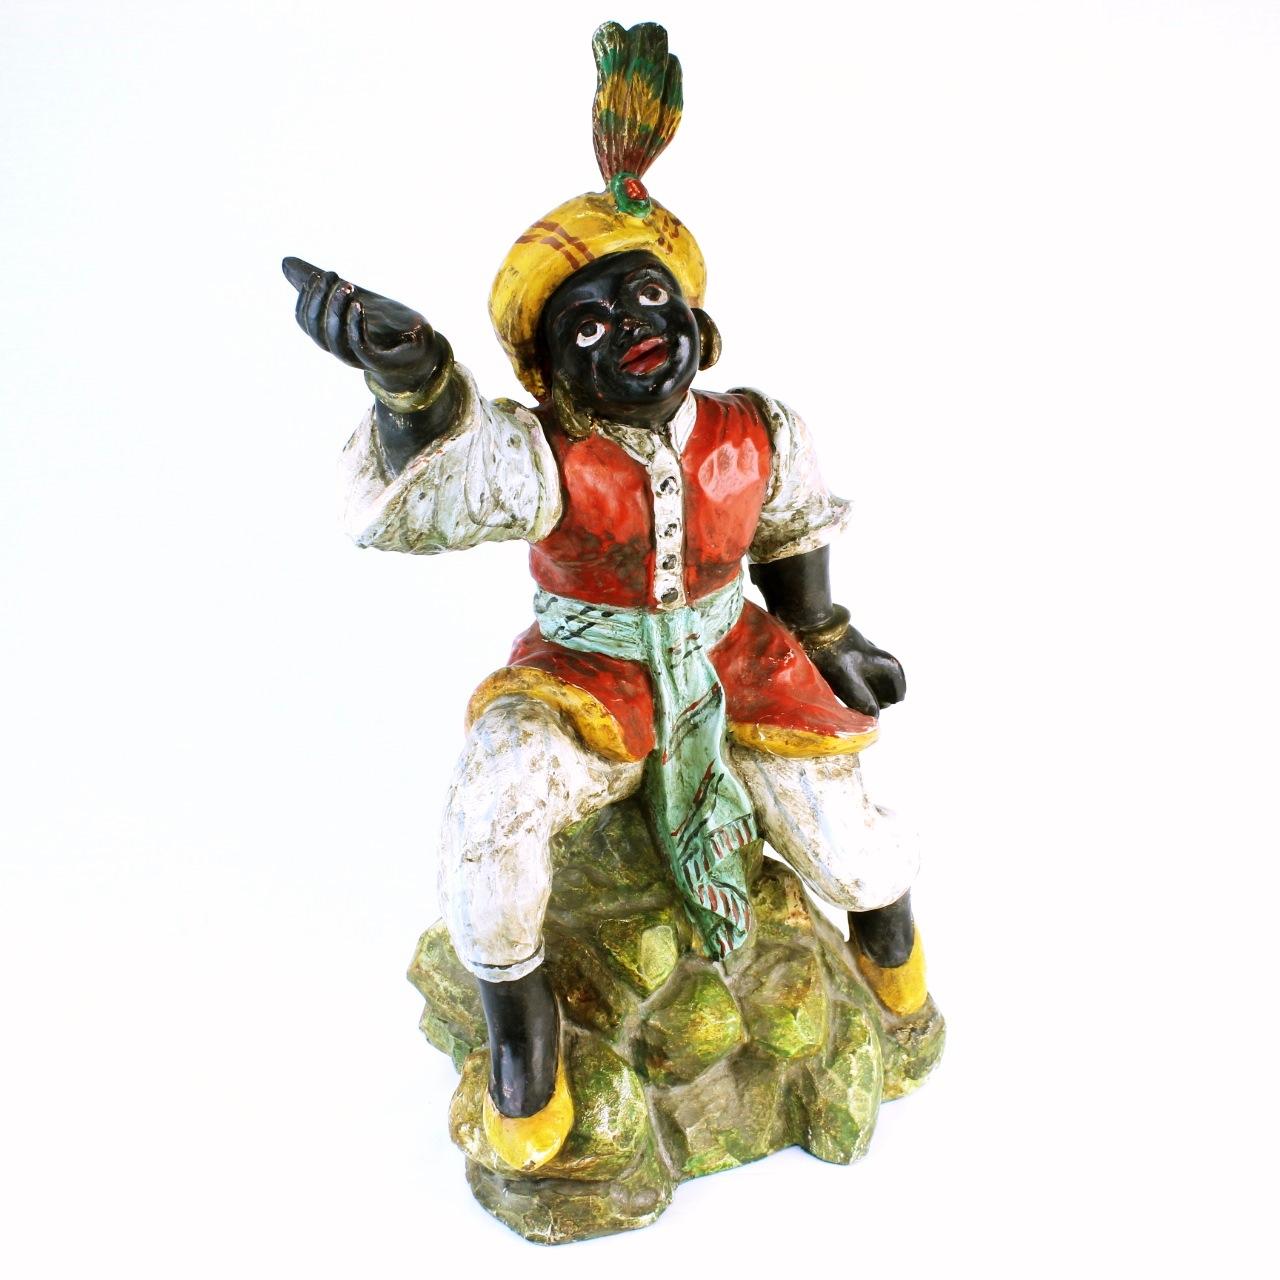 Vintage Chalkware Statue Of A Genie